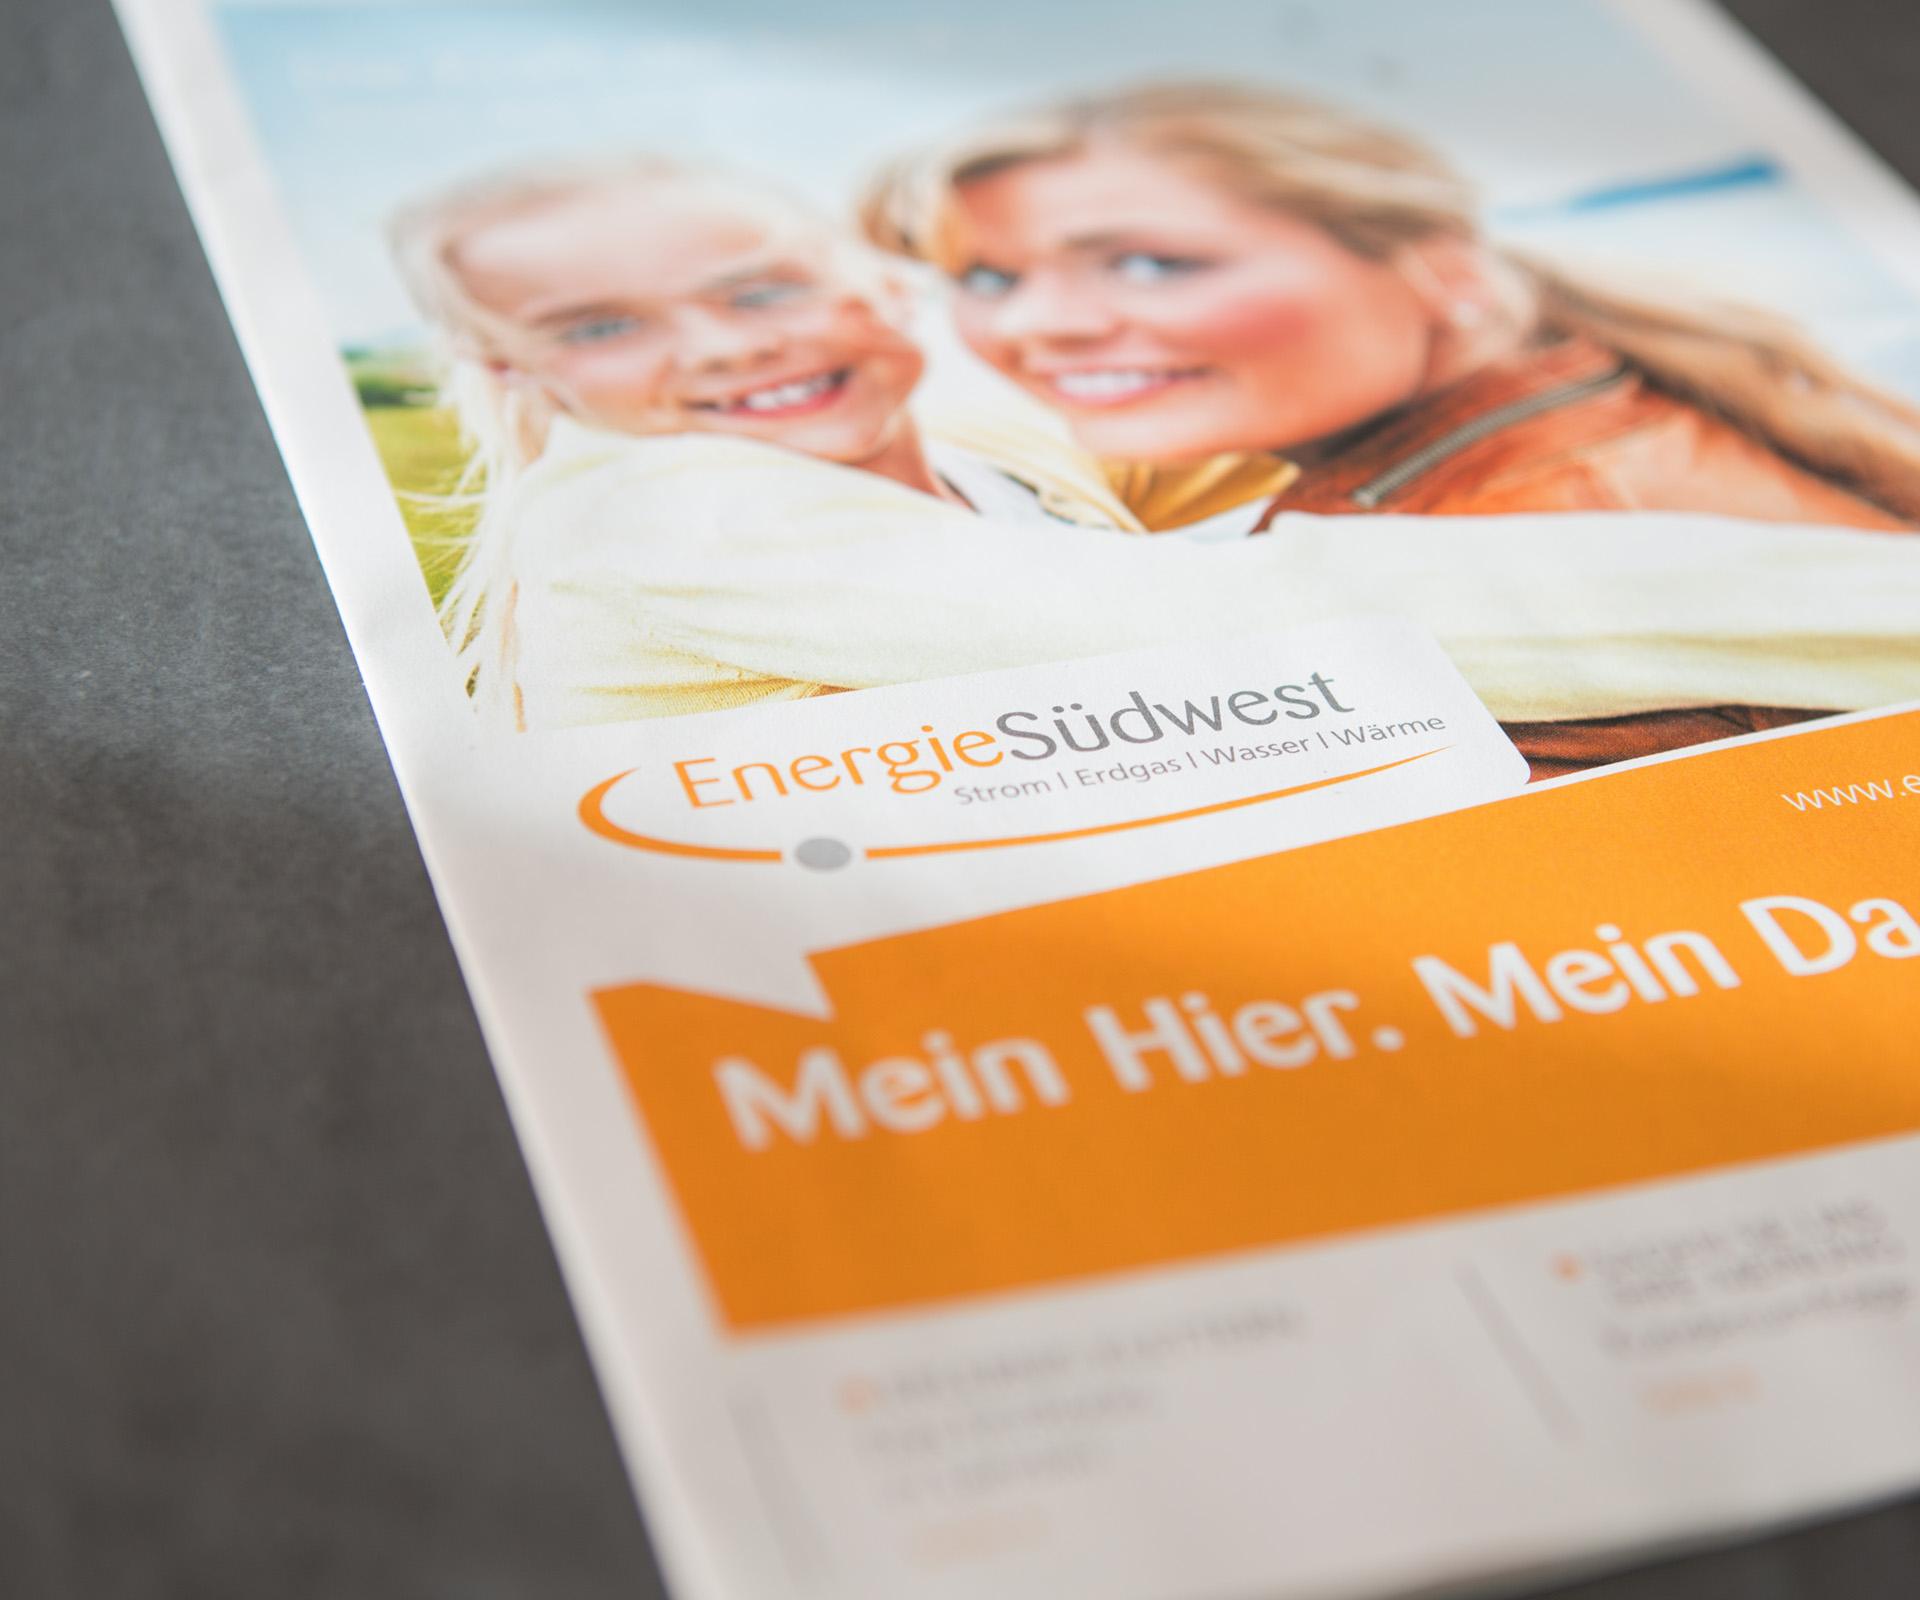 Sabath Media Werbeagentur - EnergieSüdwest - Referenzbild 2